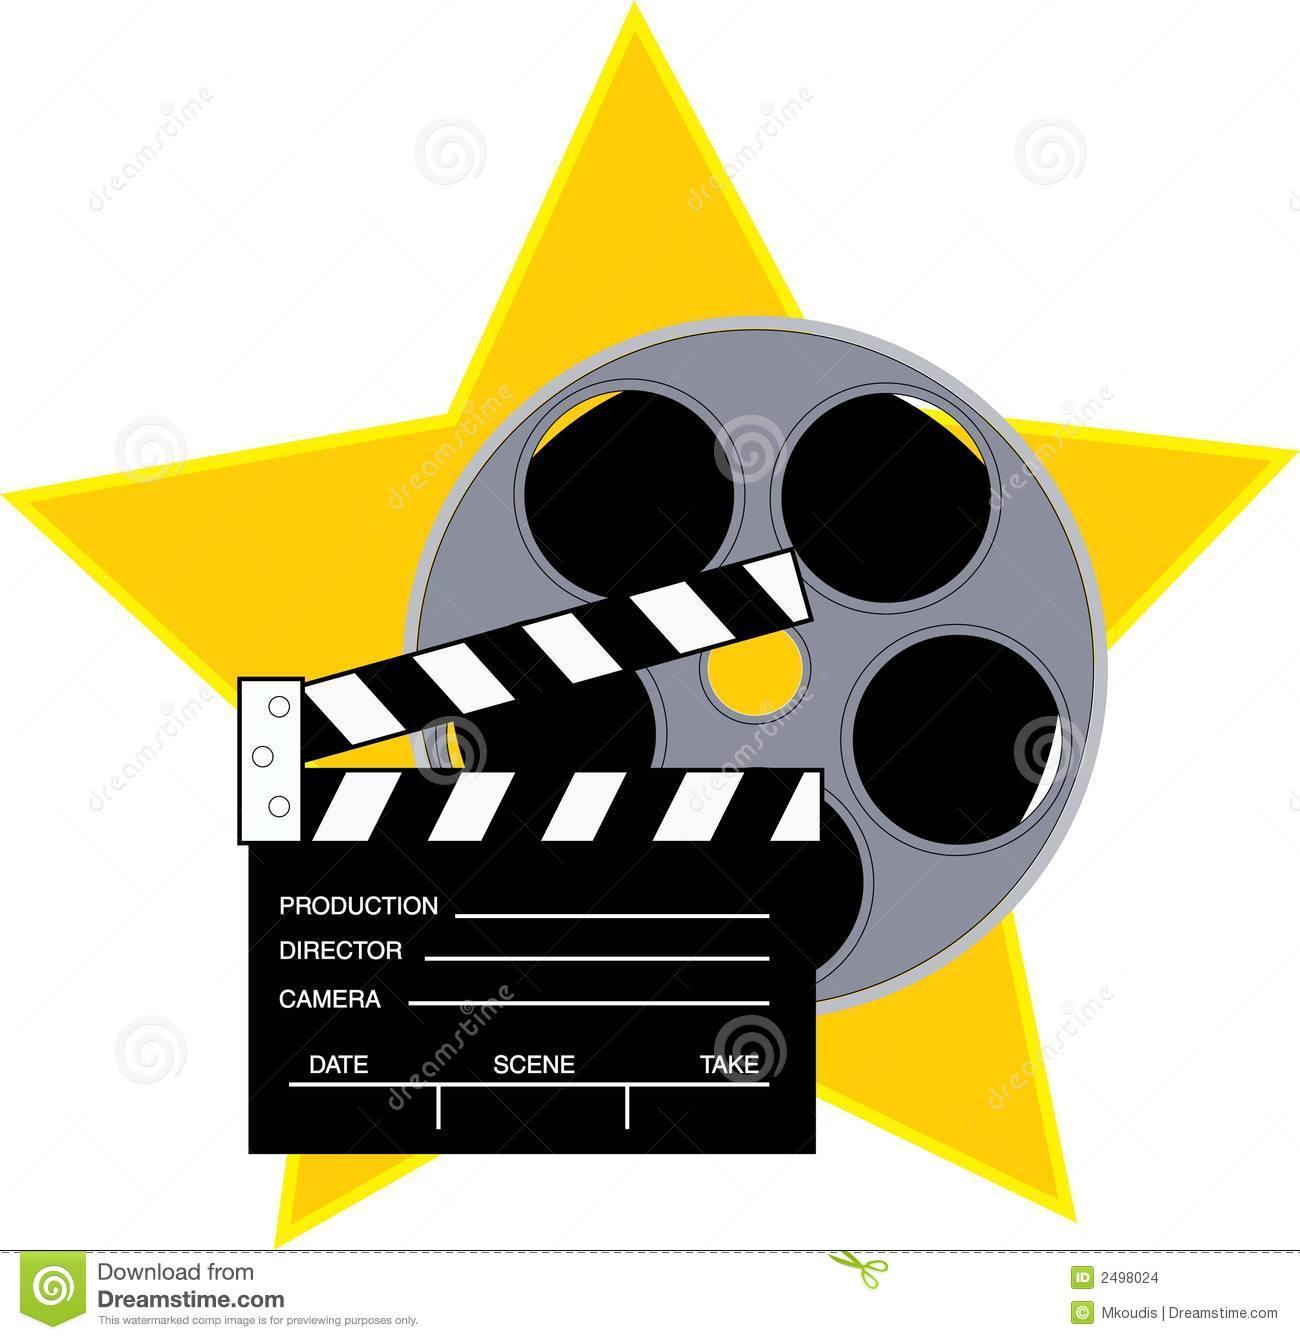 Movie Reel Border. 274cb0c4447e743dfd464679bfacfd .